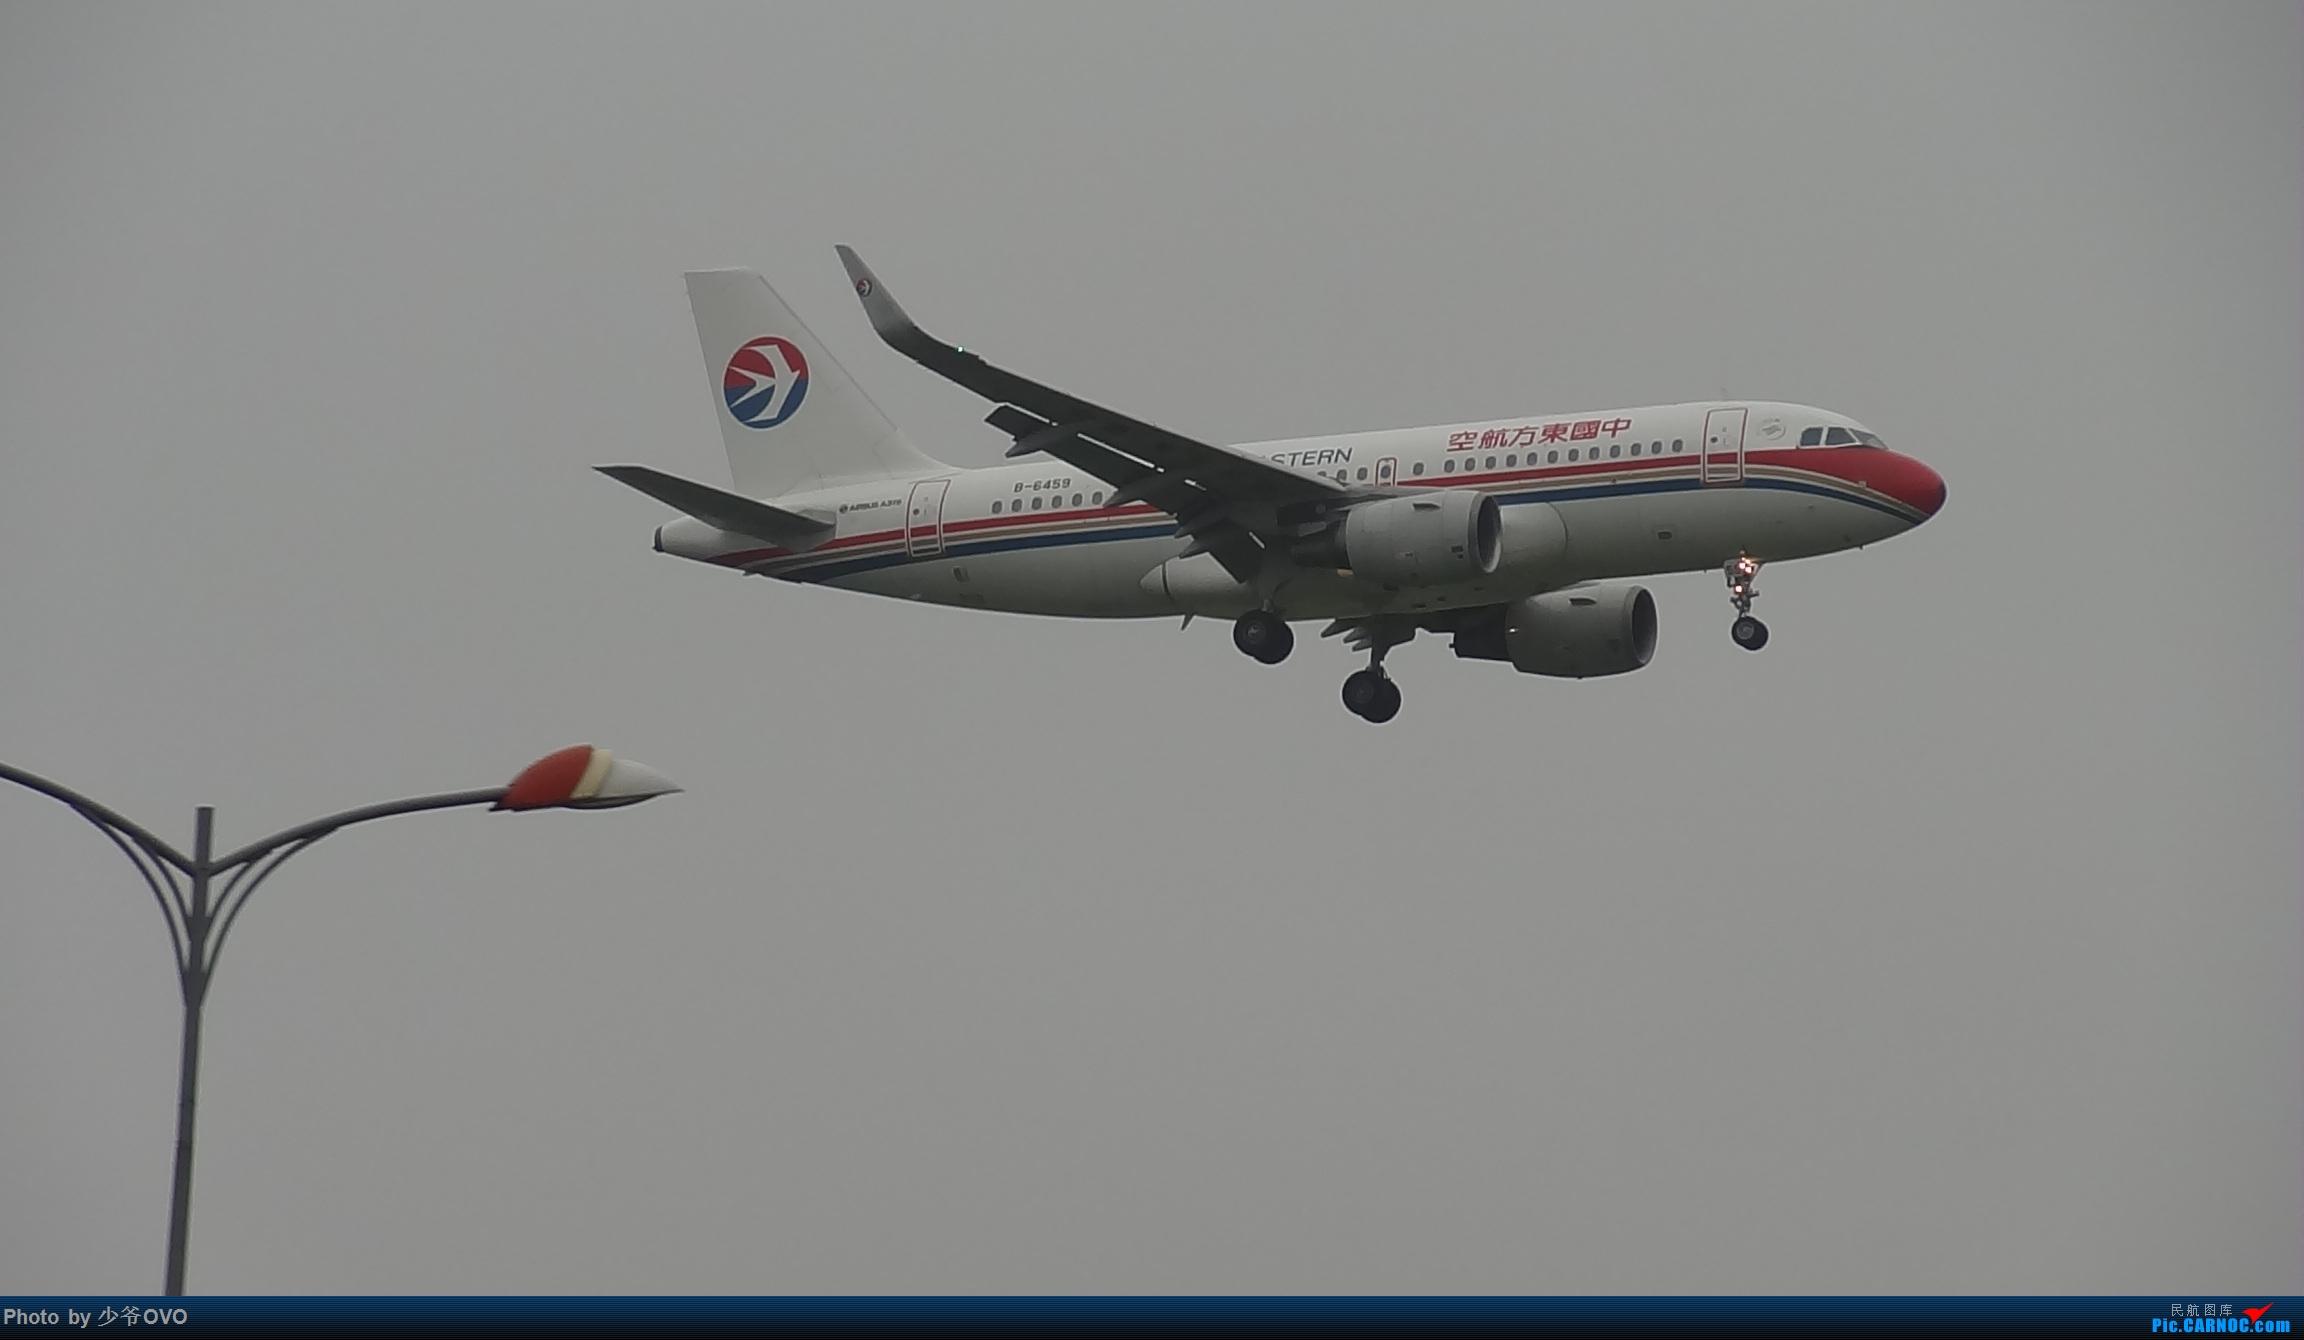 Re:[原创]CKG重庆江北机场拍机 ,渣图一堆,多指点 AIRBUS A319-100 B-6459 中国重庆江北国际机场